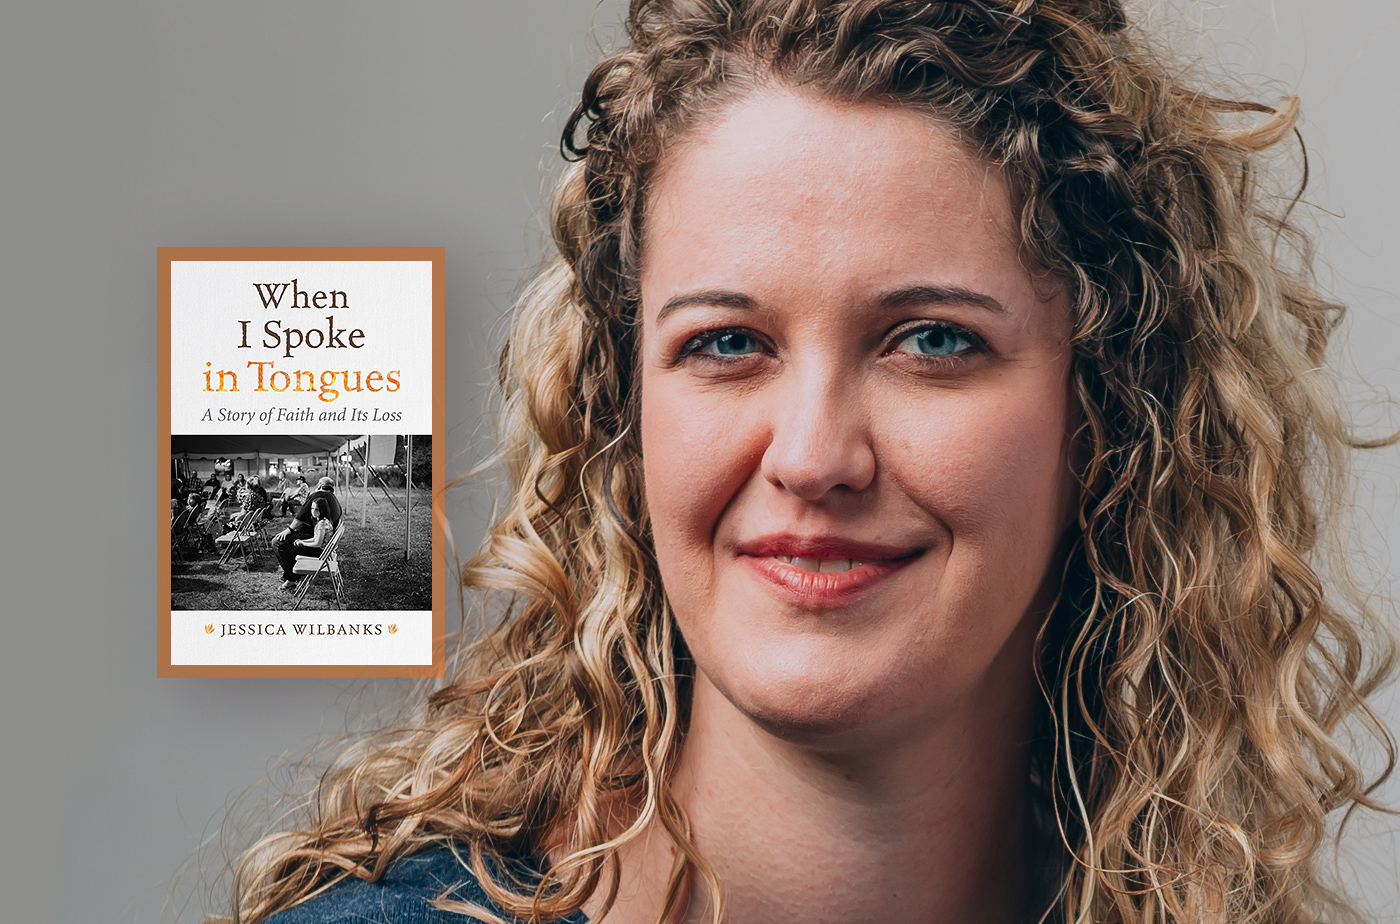 Catapult online classes: Jessica Wilbanks, 6-Week Online Nonfiction Workshop: Memoir 101, Nonfiction, Memoir, Workshop